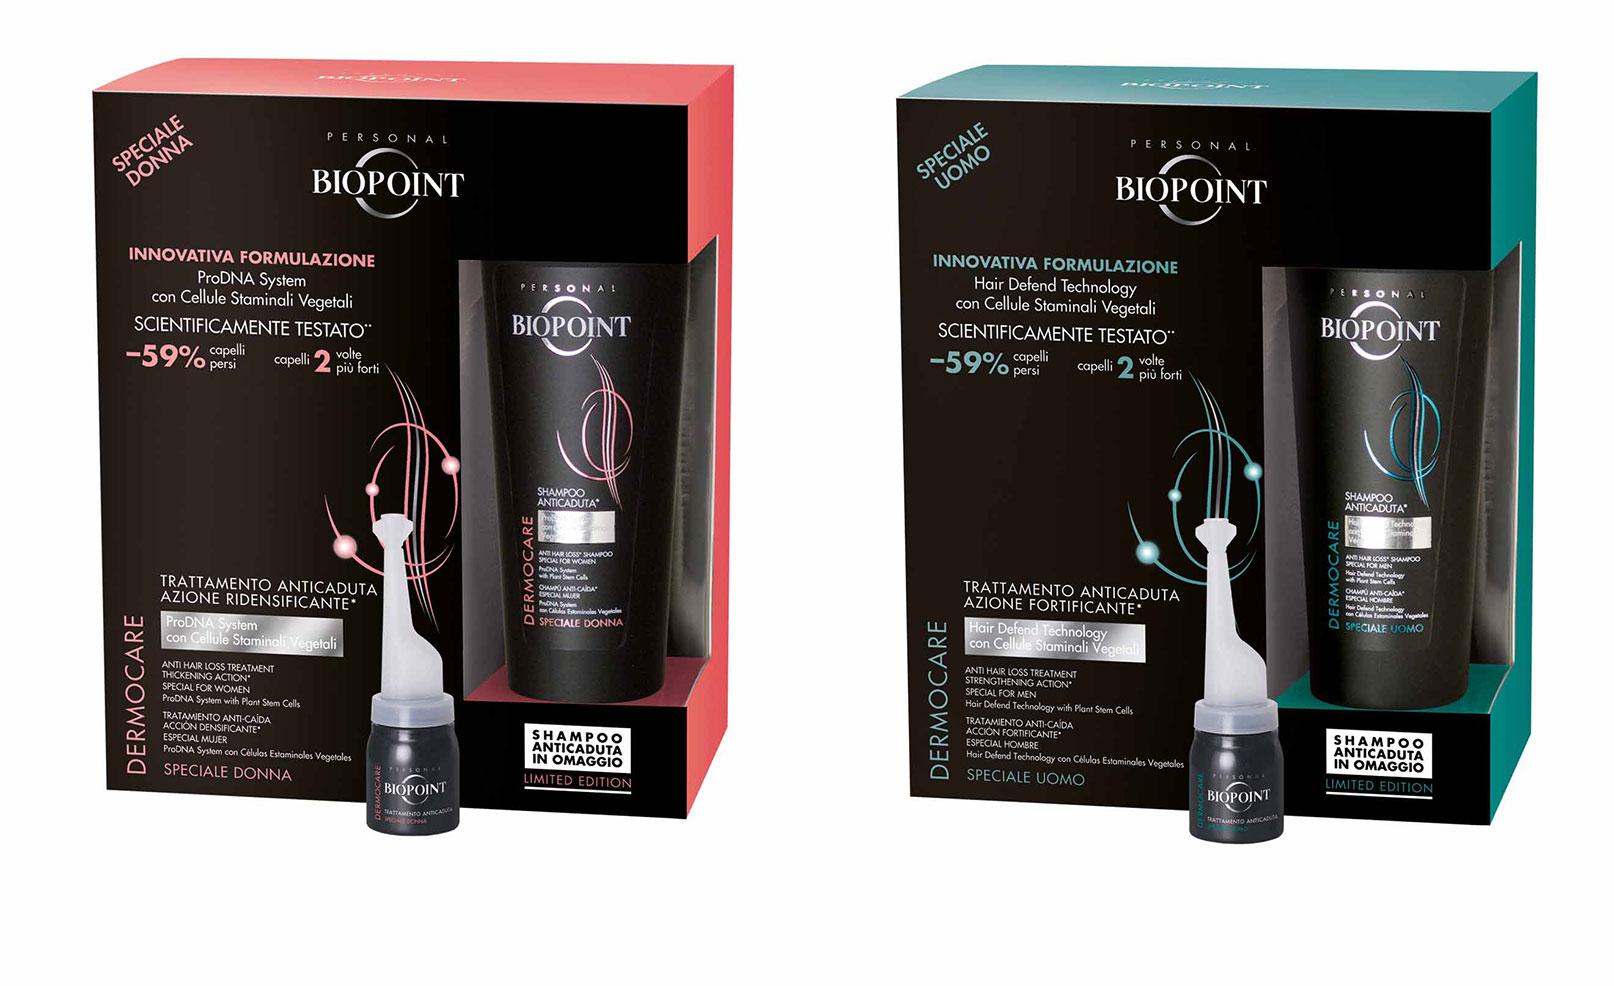 kit-Anticaduta-Insieme- limited biopoint-karotina-novità-capelli